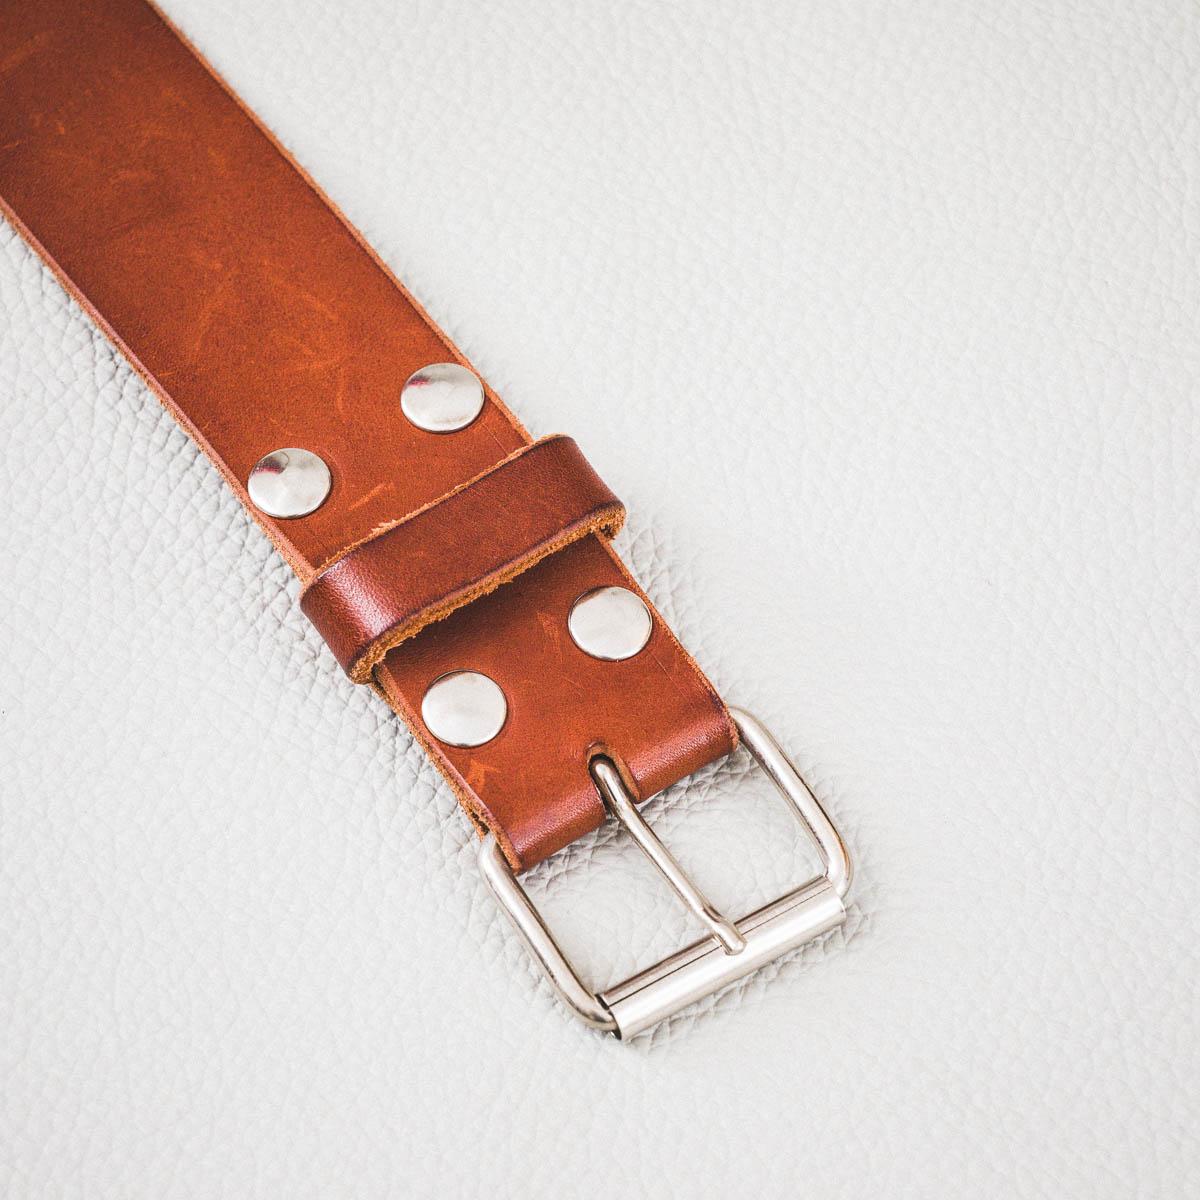 ceinture cuir châtaigne rivetée